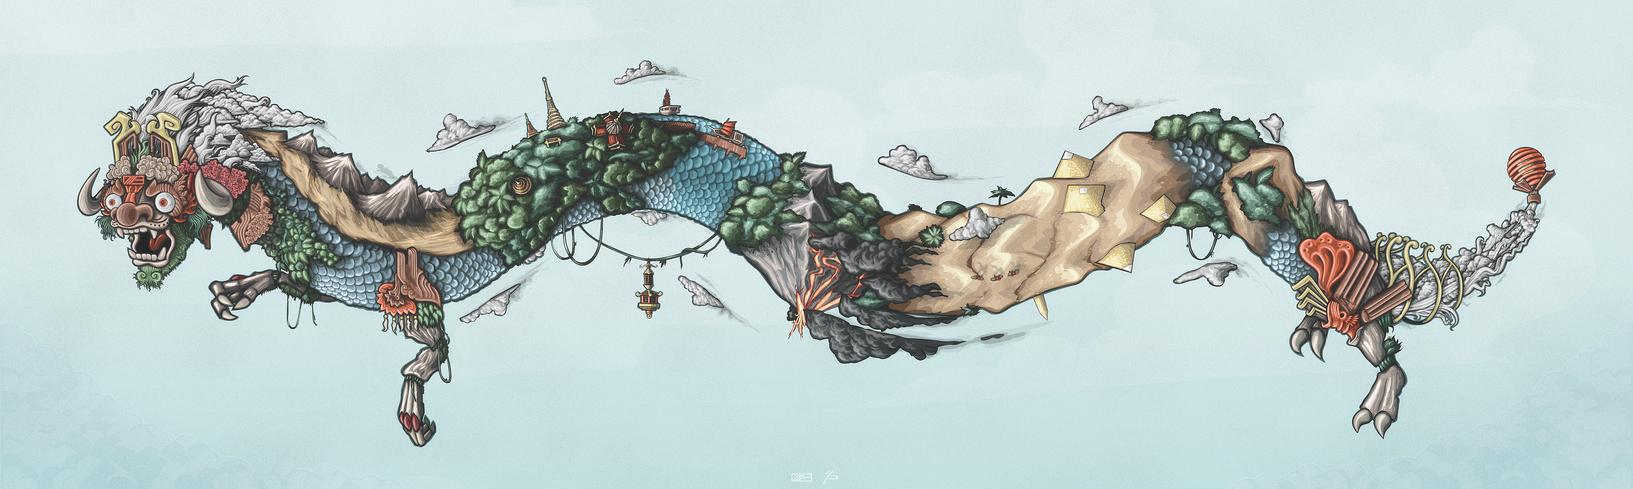 Savage Civilization by JDeVector